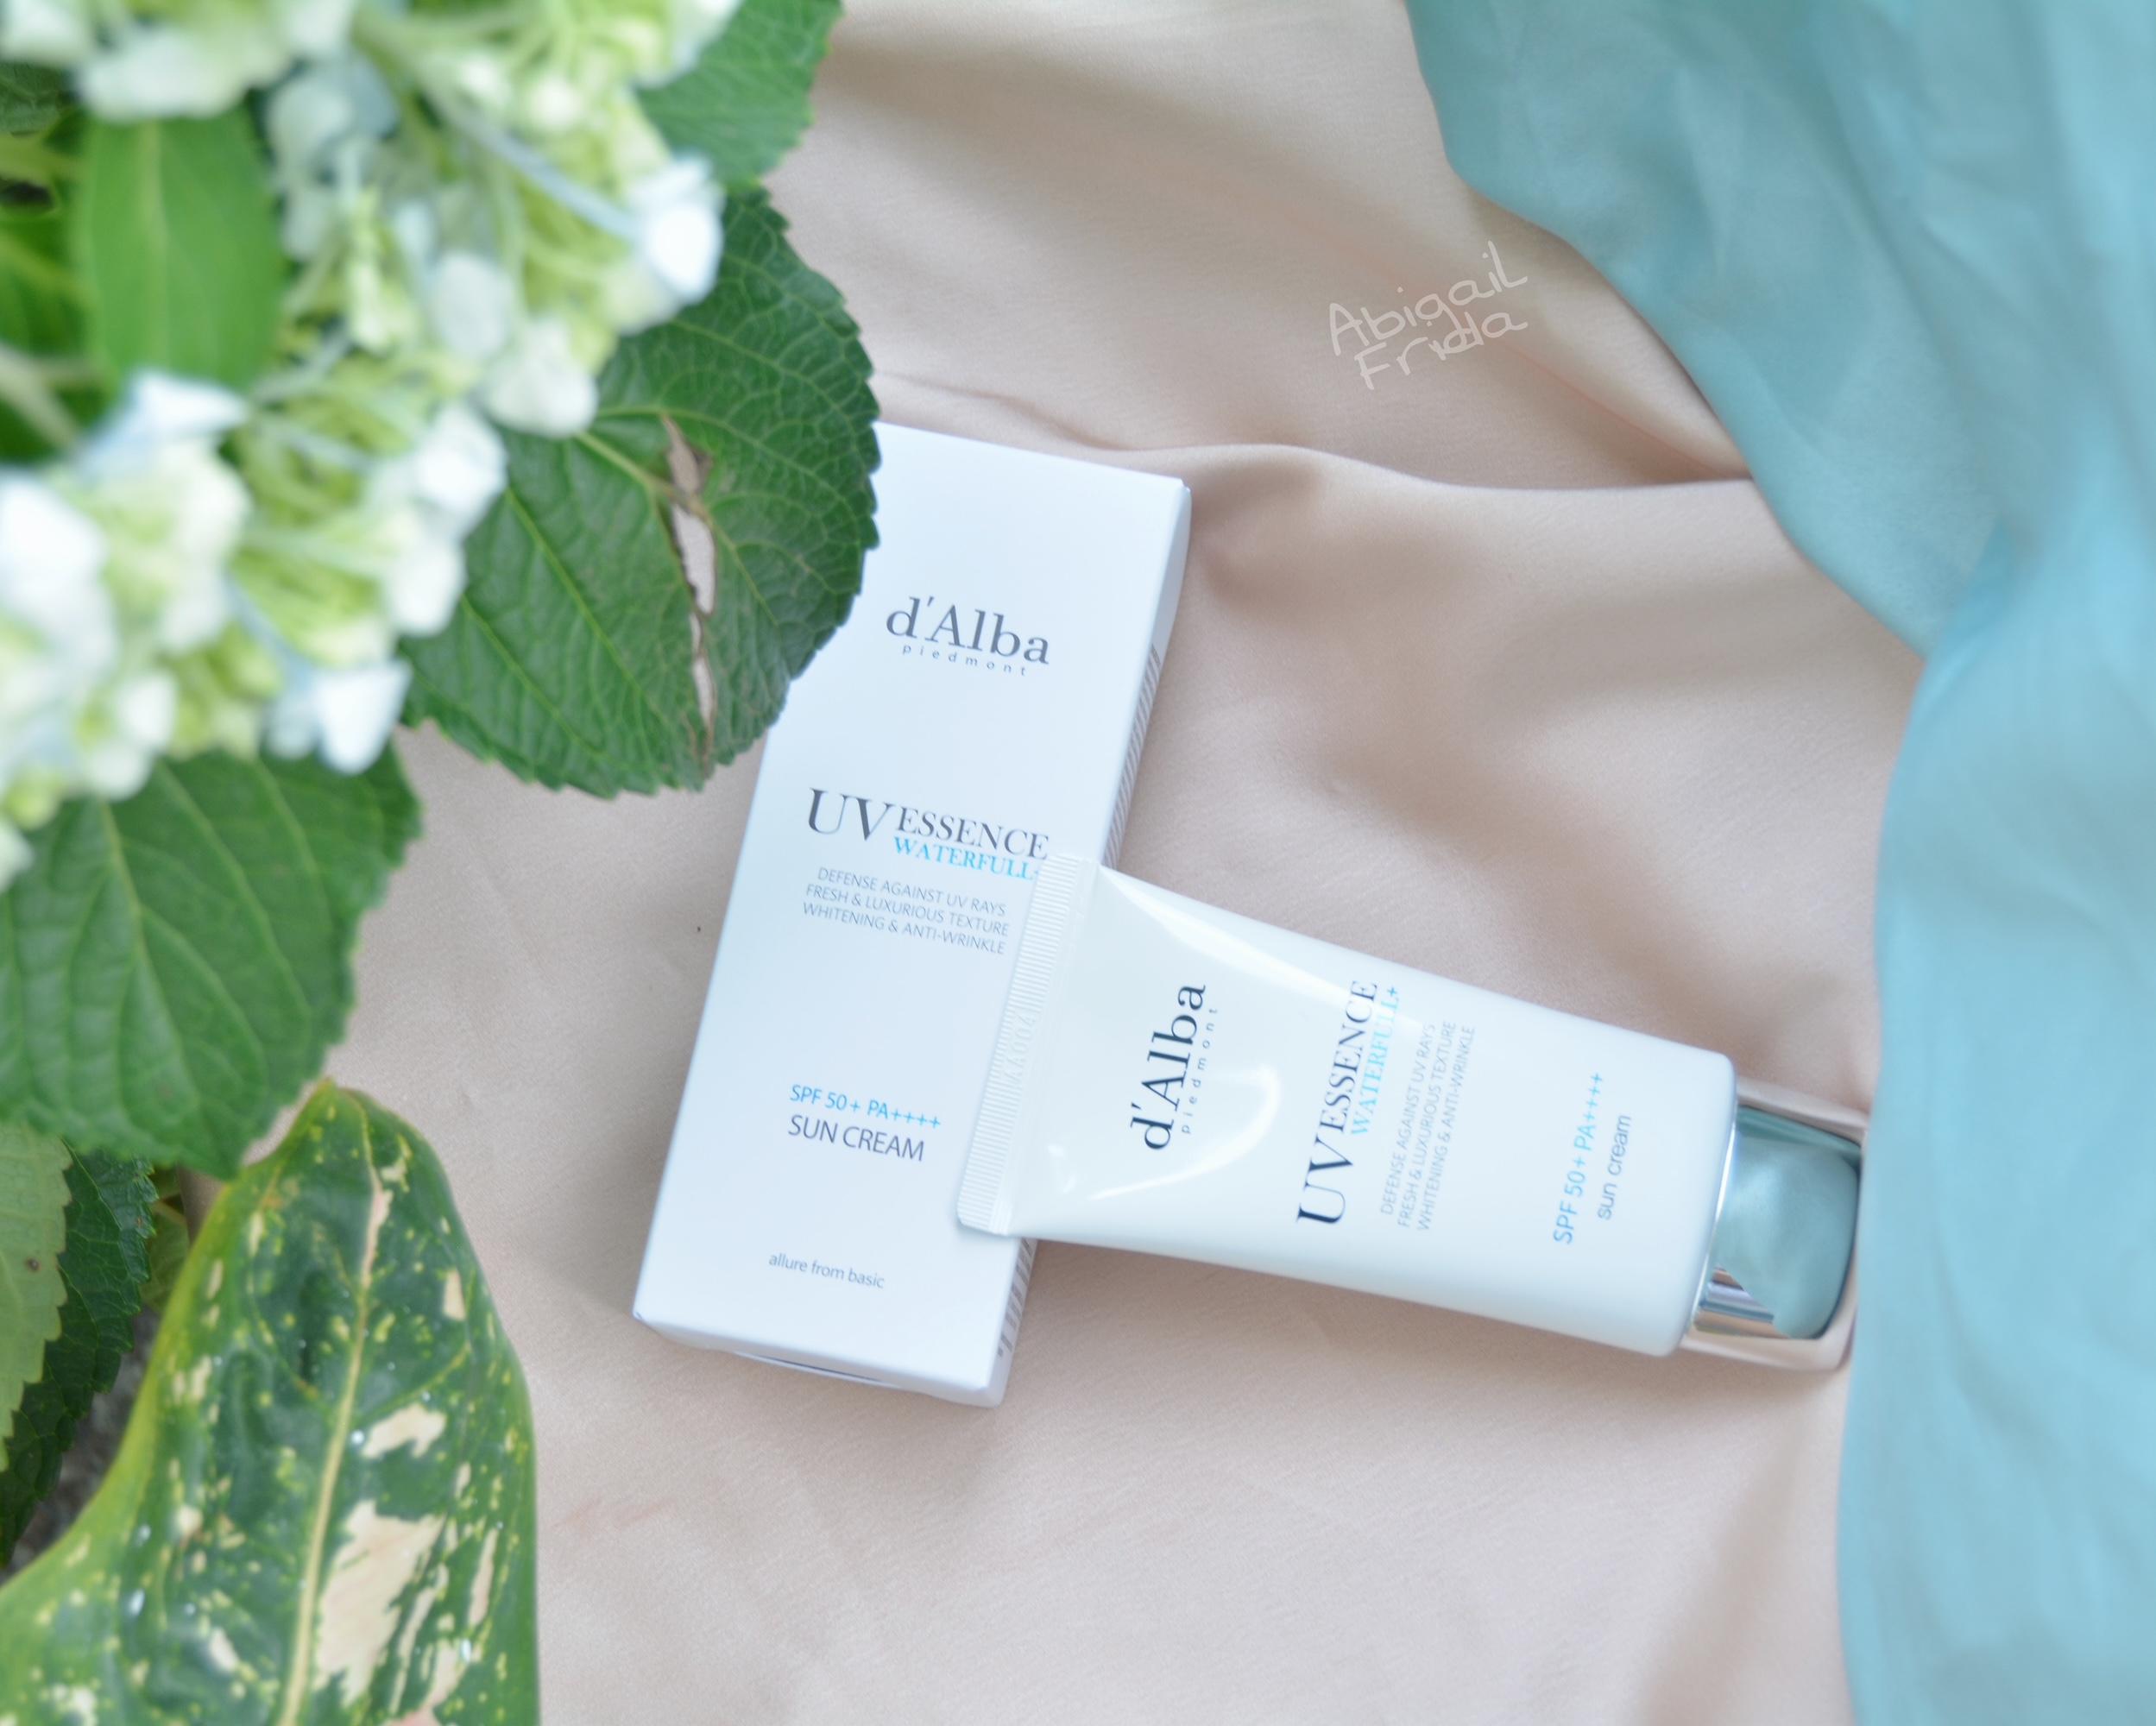 d'Alba UV Essence Waterfull Sun Cream SPF 50+ PA++++